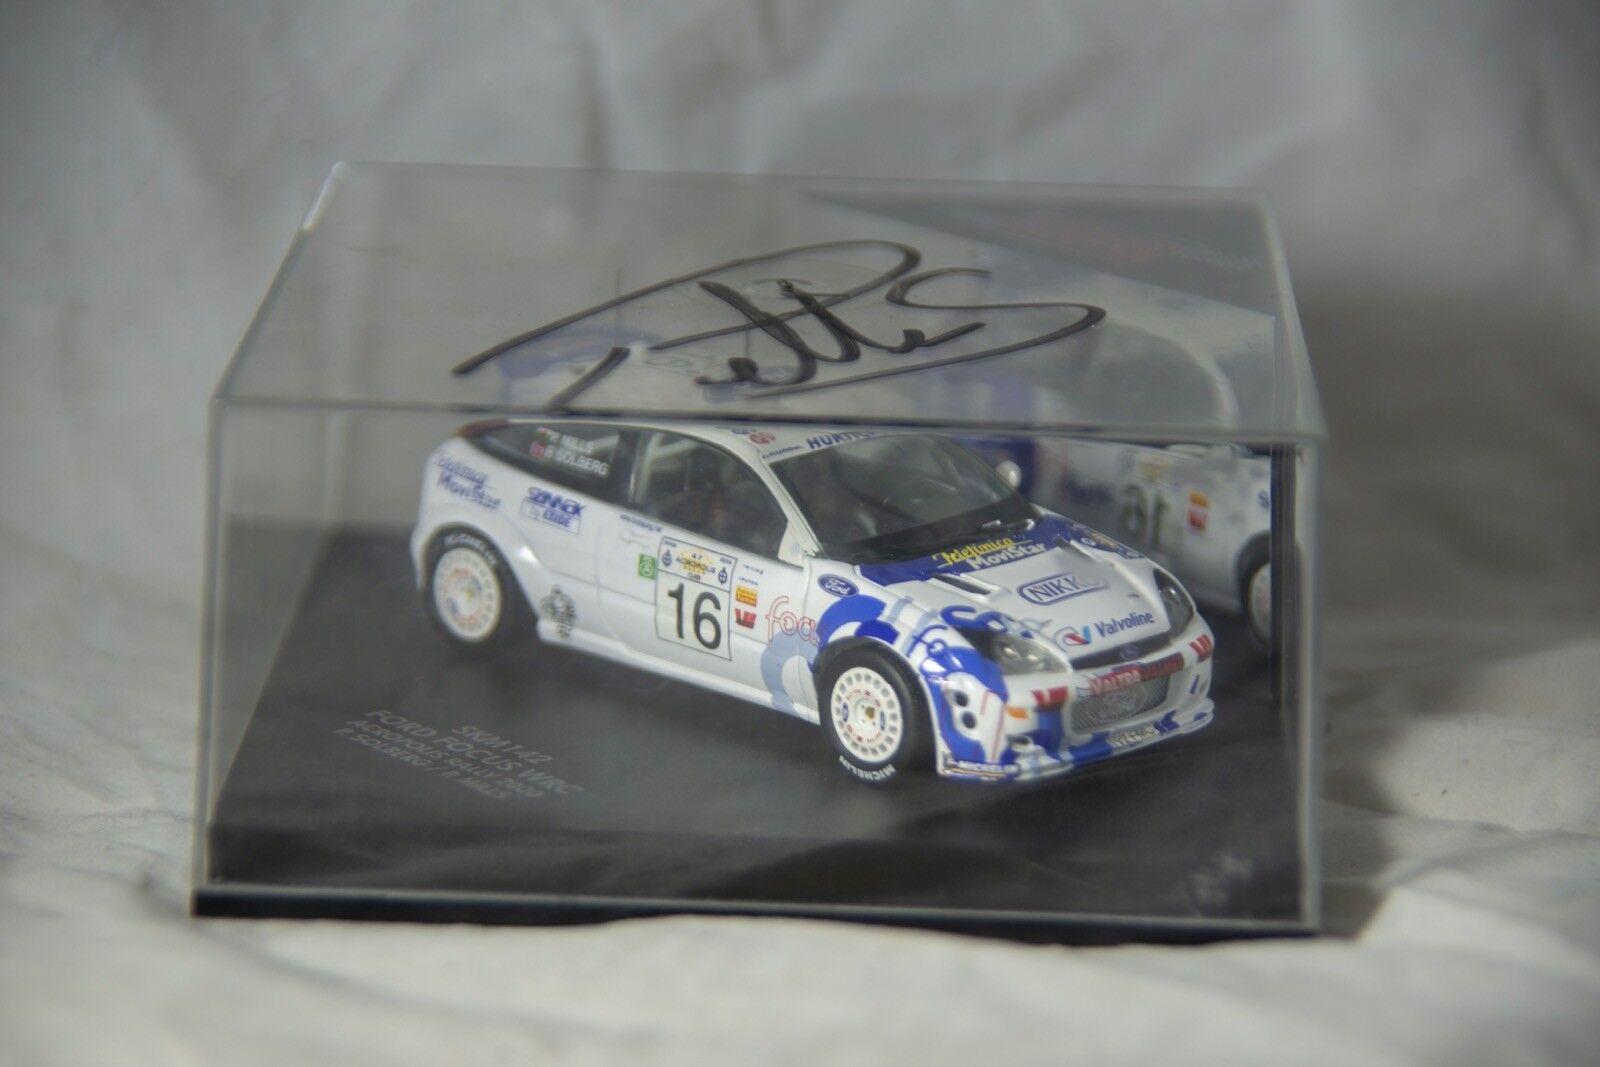 Skid SKM143 1:43 Ford Focus WRC Acropolis Rally 2000 Petter Solberg Philip Mills